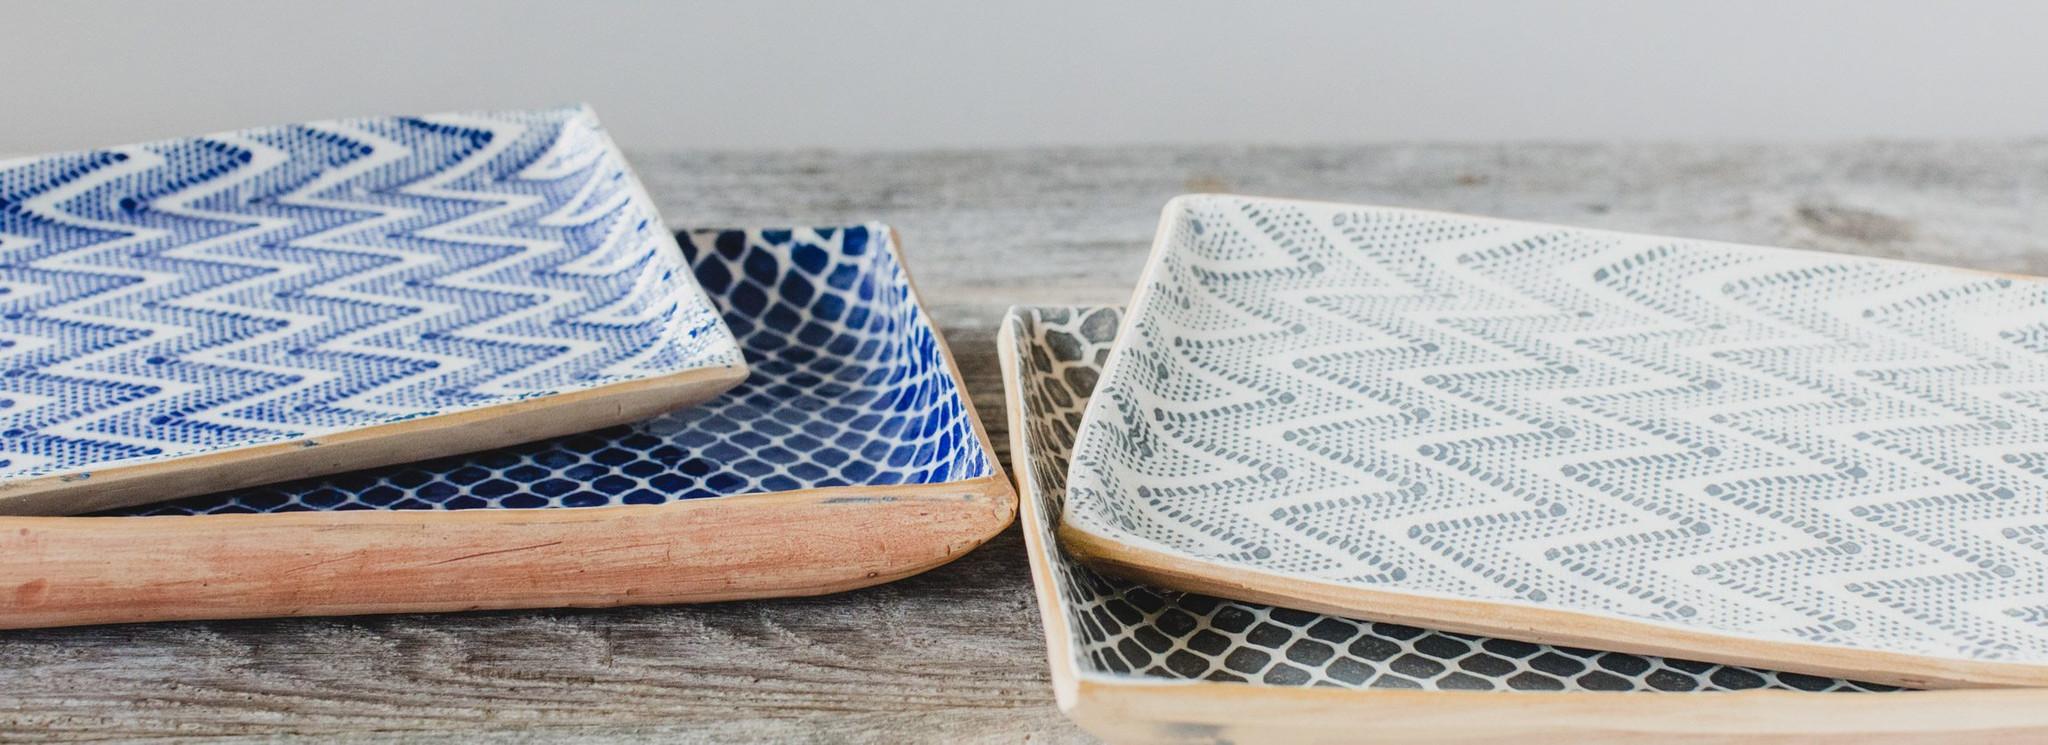 Handmade Ceramic Serving Platters